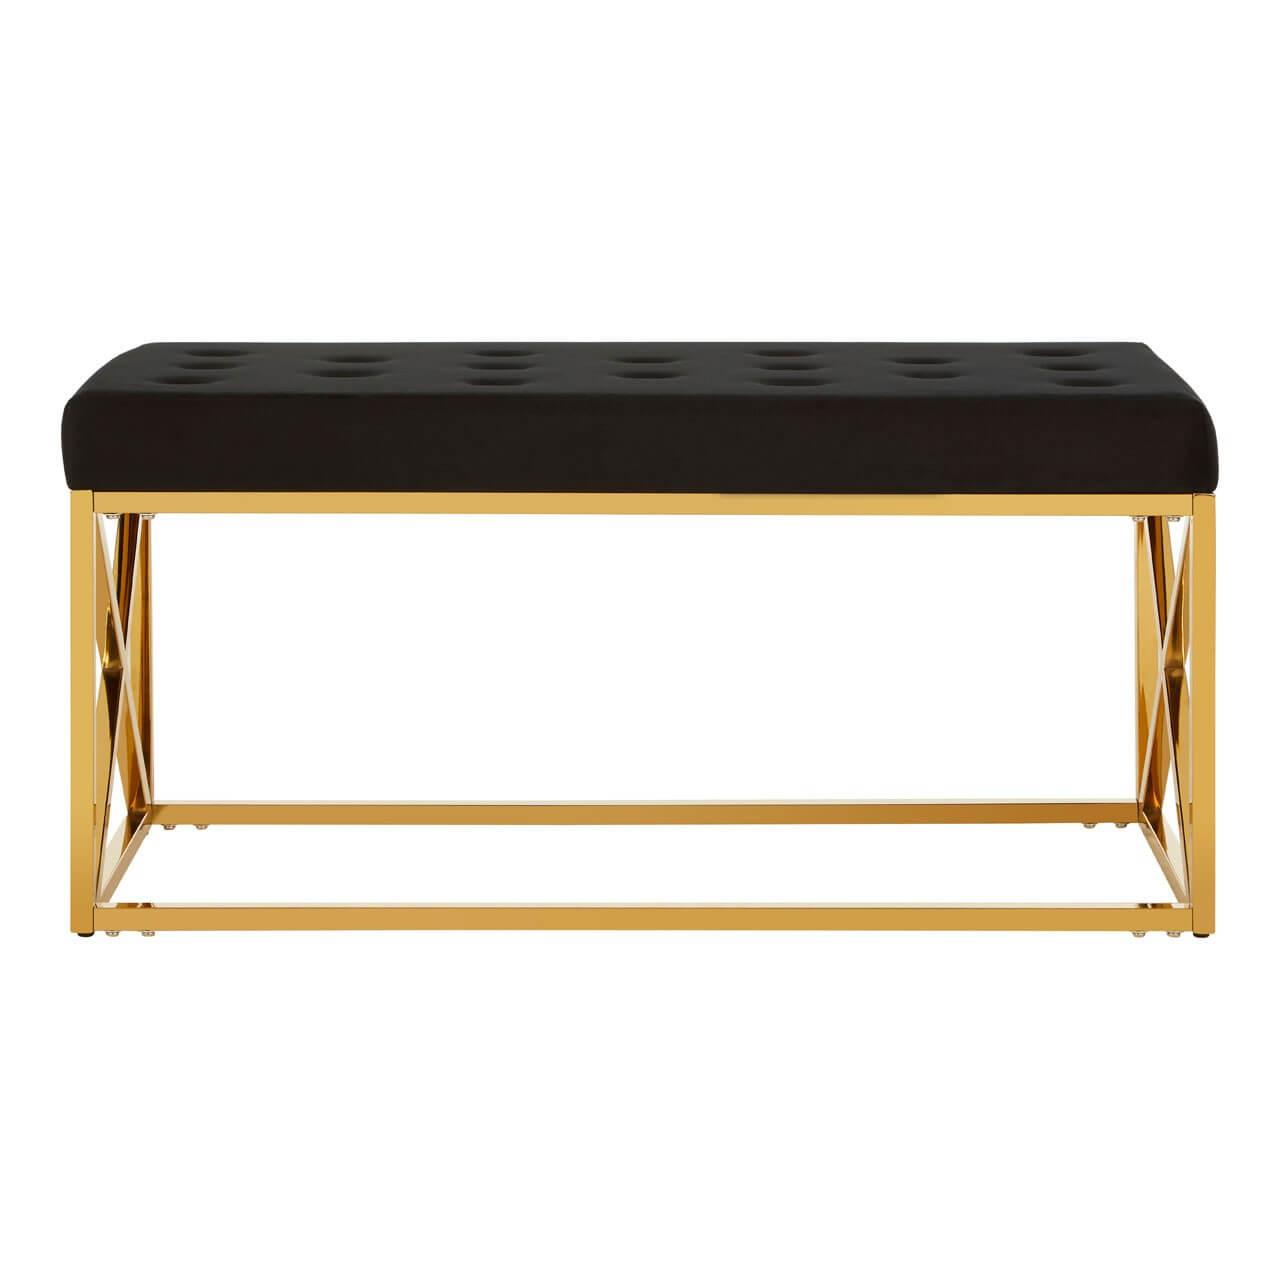 Adrian Black Velvet Tufted Seat And Gold Finish Bench Designer Sofas 4u